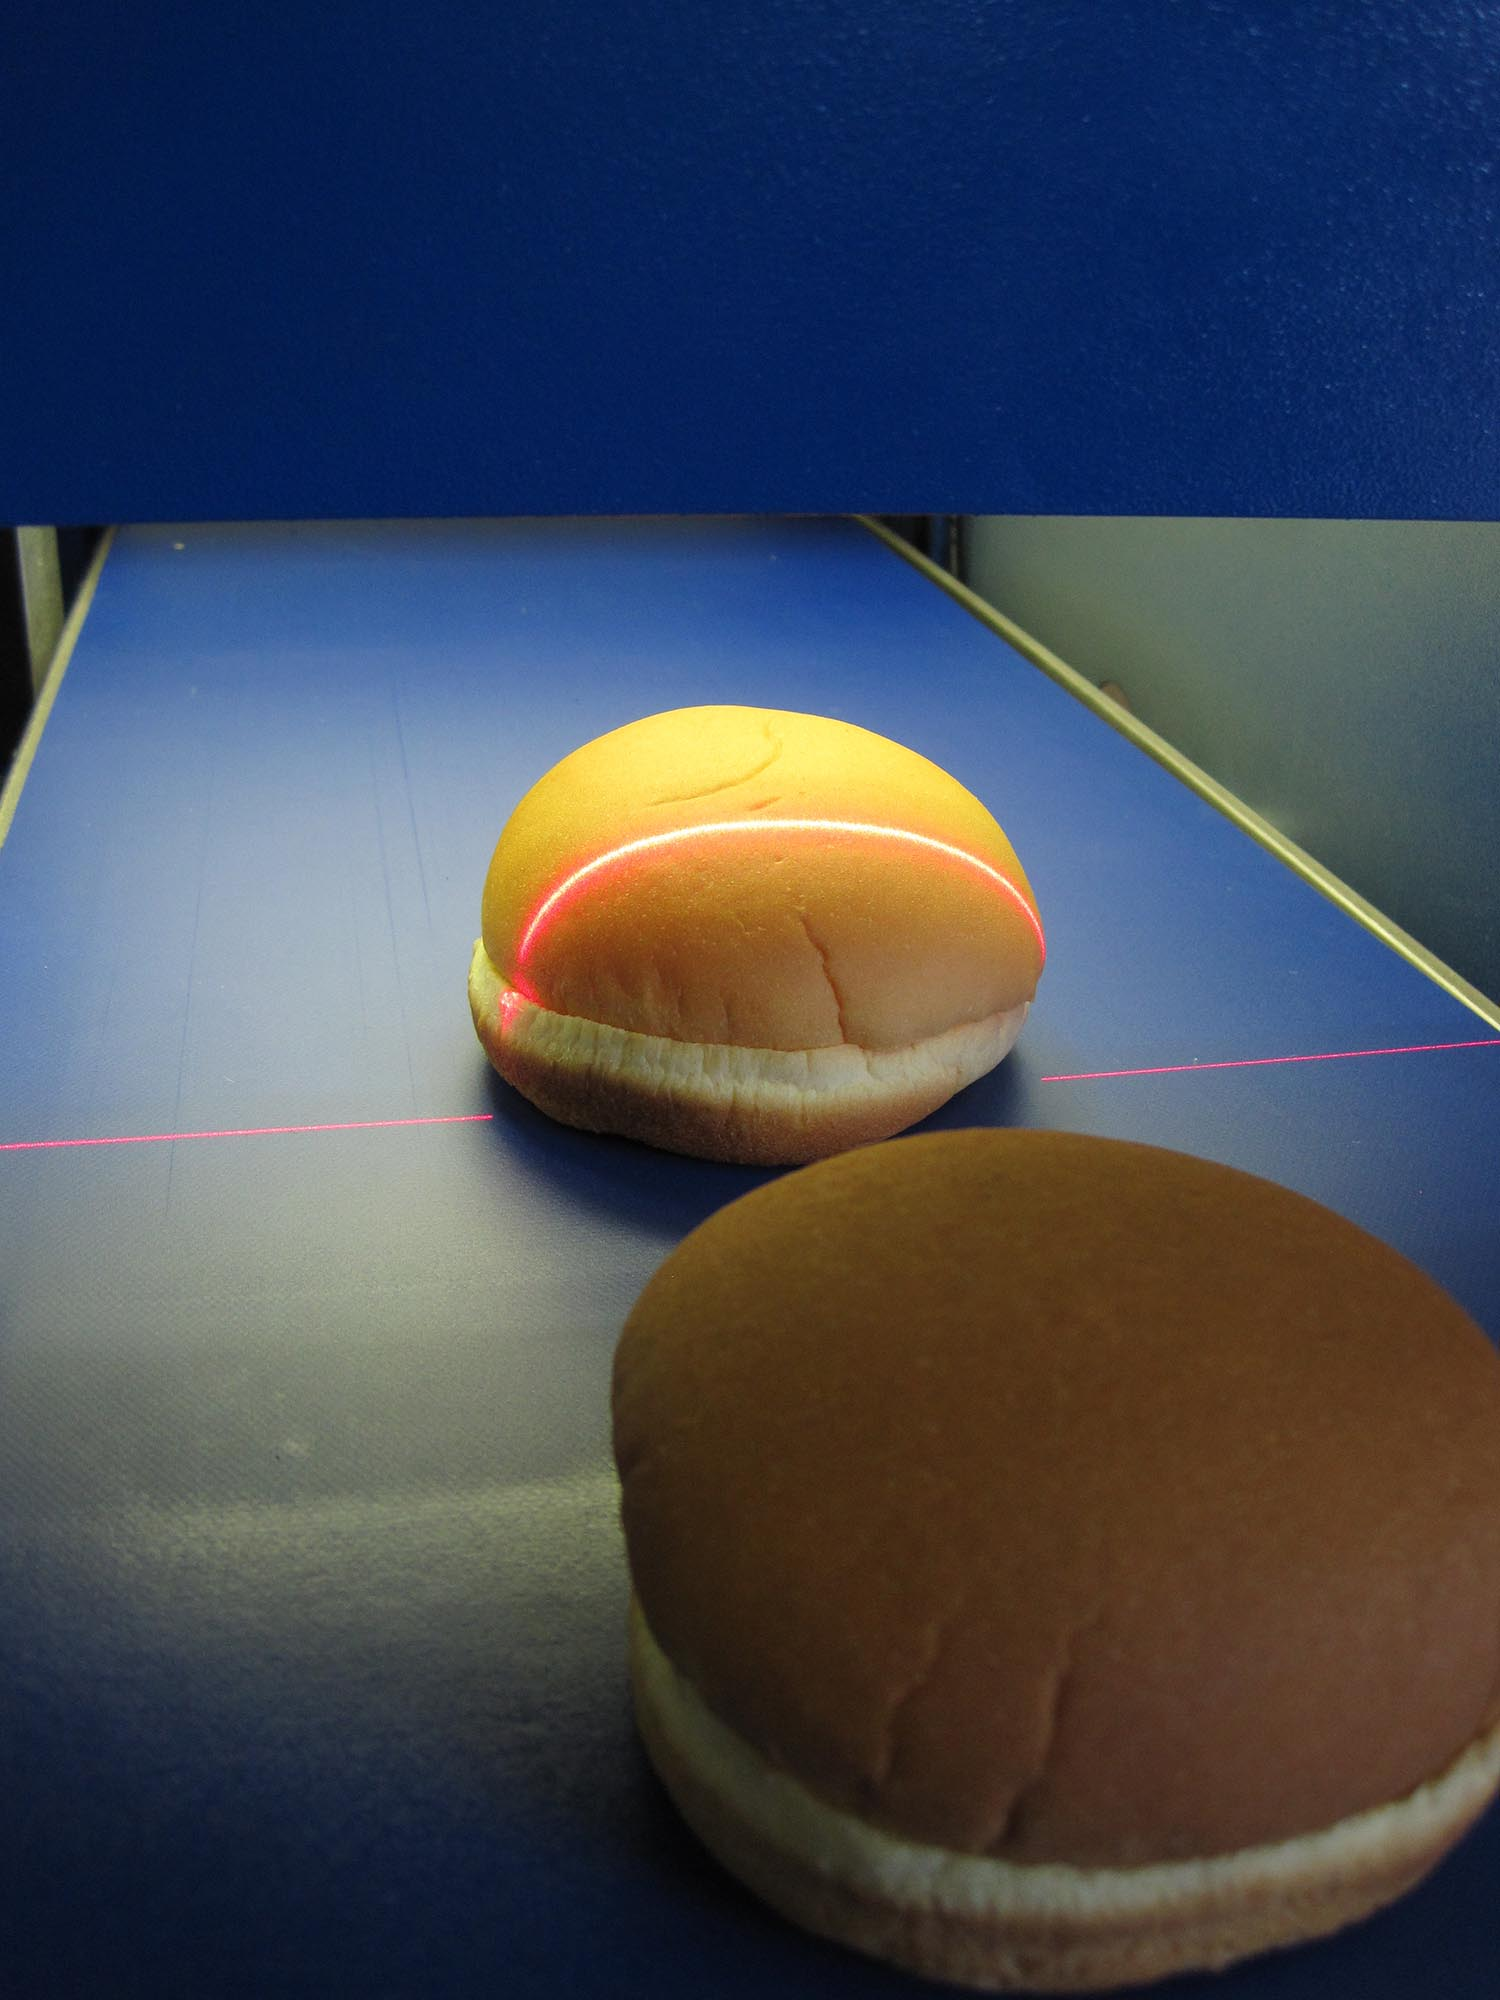 Hamburger Bun Inspection with the Sightline Benchtop QA Measurement System